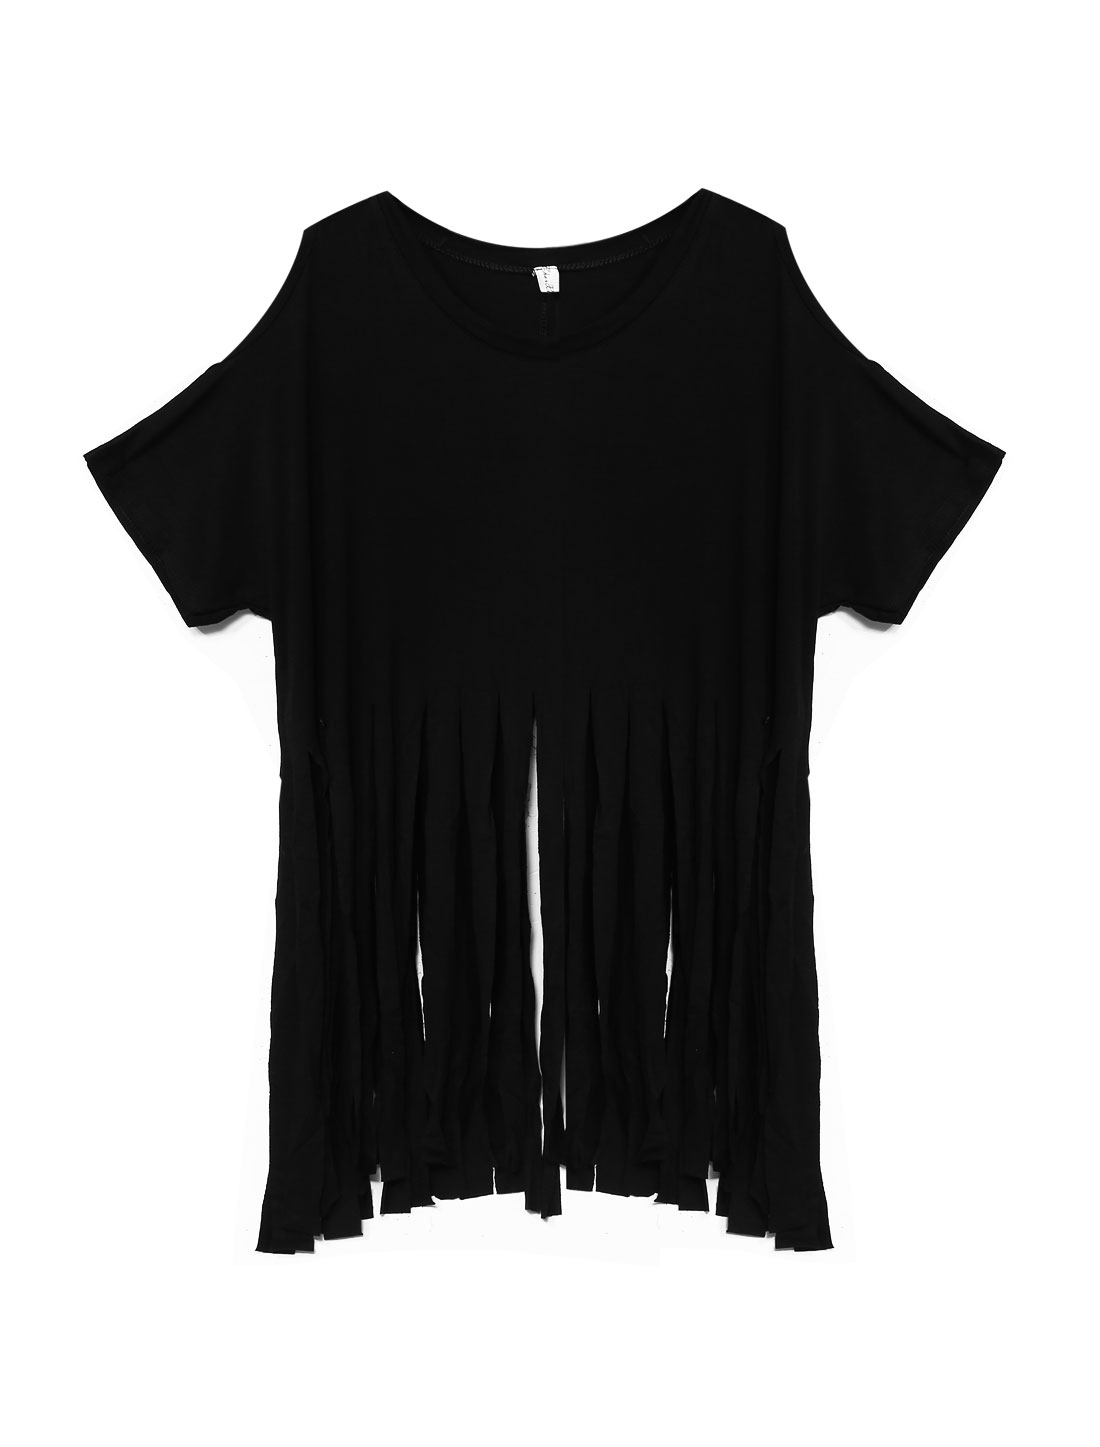 Woman Cold Shoulders Fringed Hem Short Sleeves Slipover Top Black XS